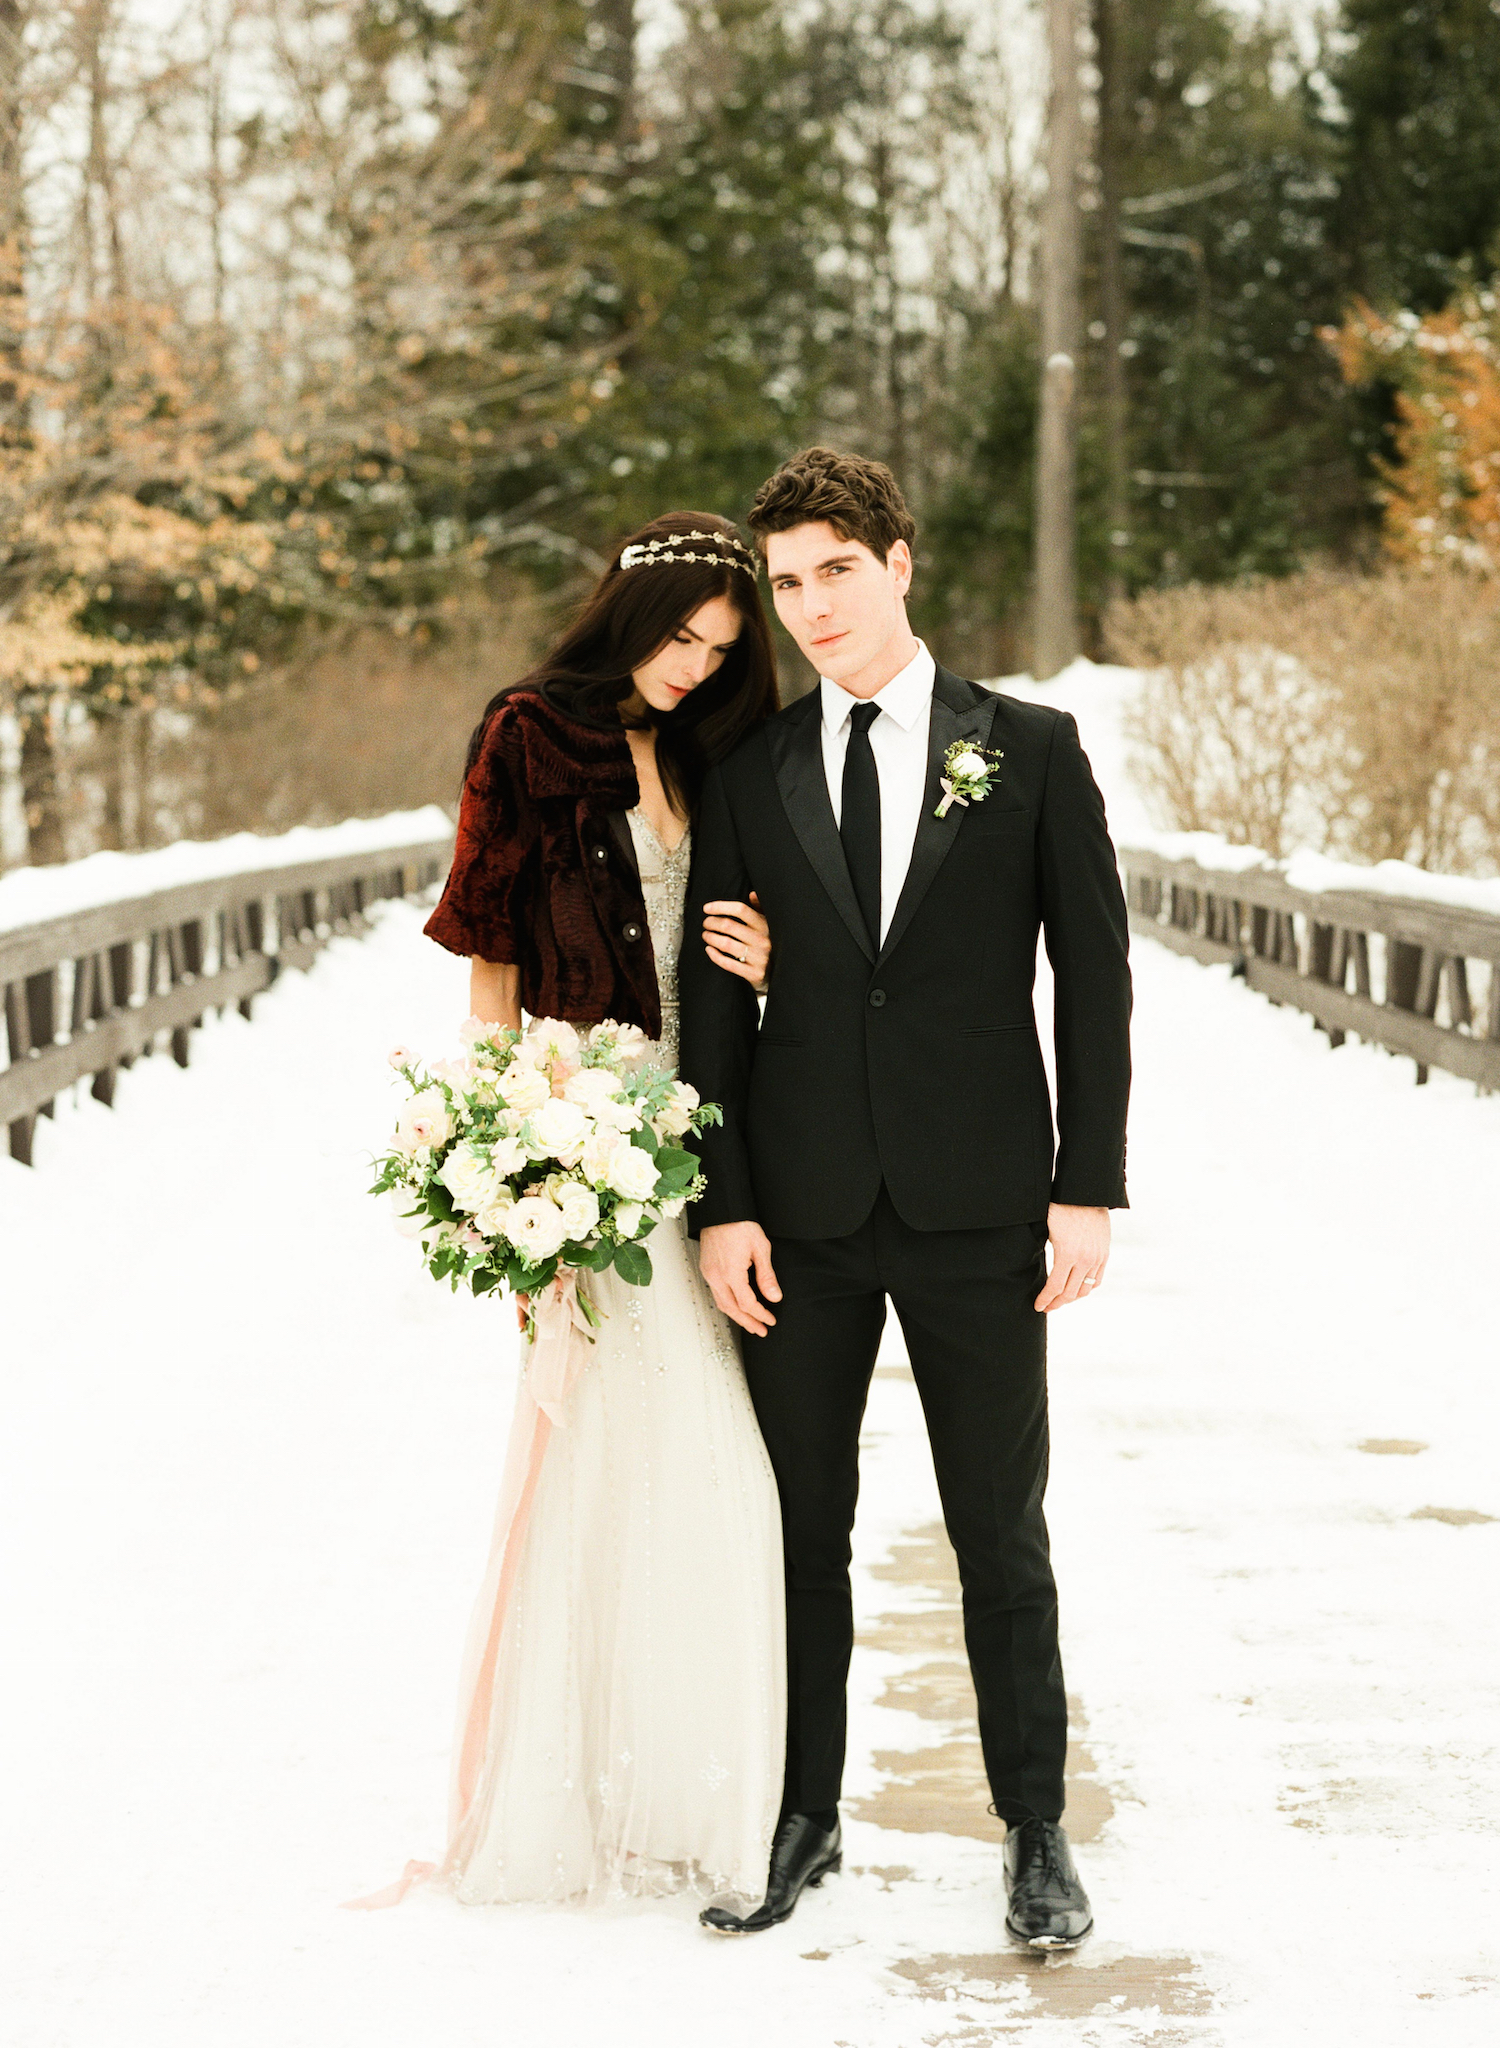 Winter Editorial-JennyPackham-LindsayMaddenPhotography-02 copy.jpg